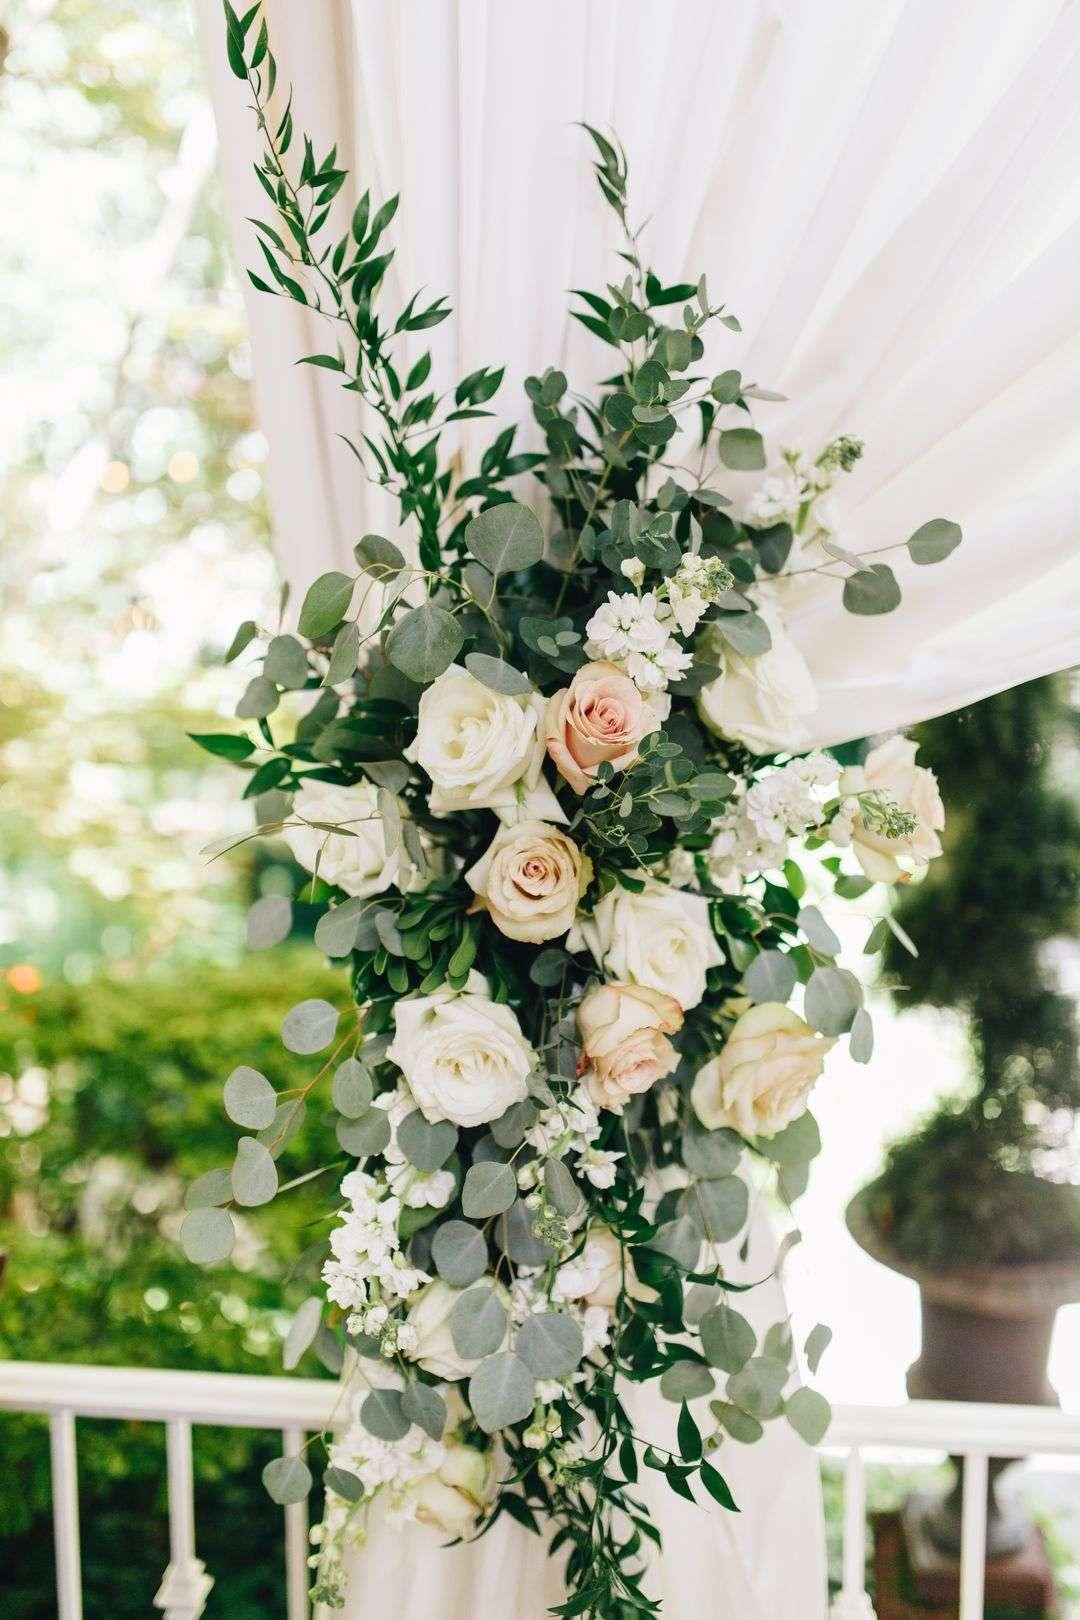 blush and white wedding reception flowers